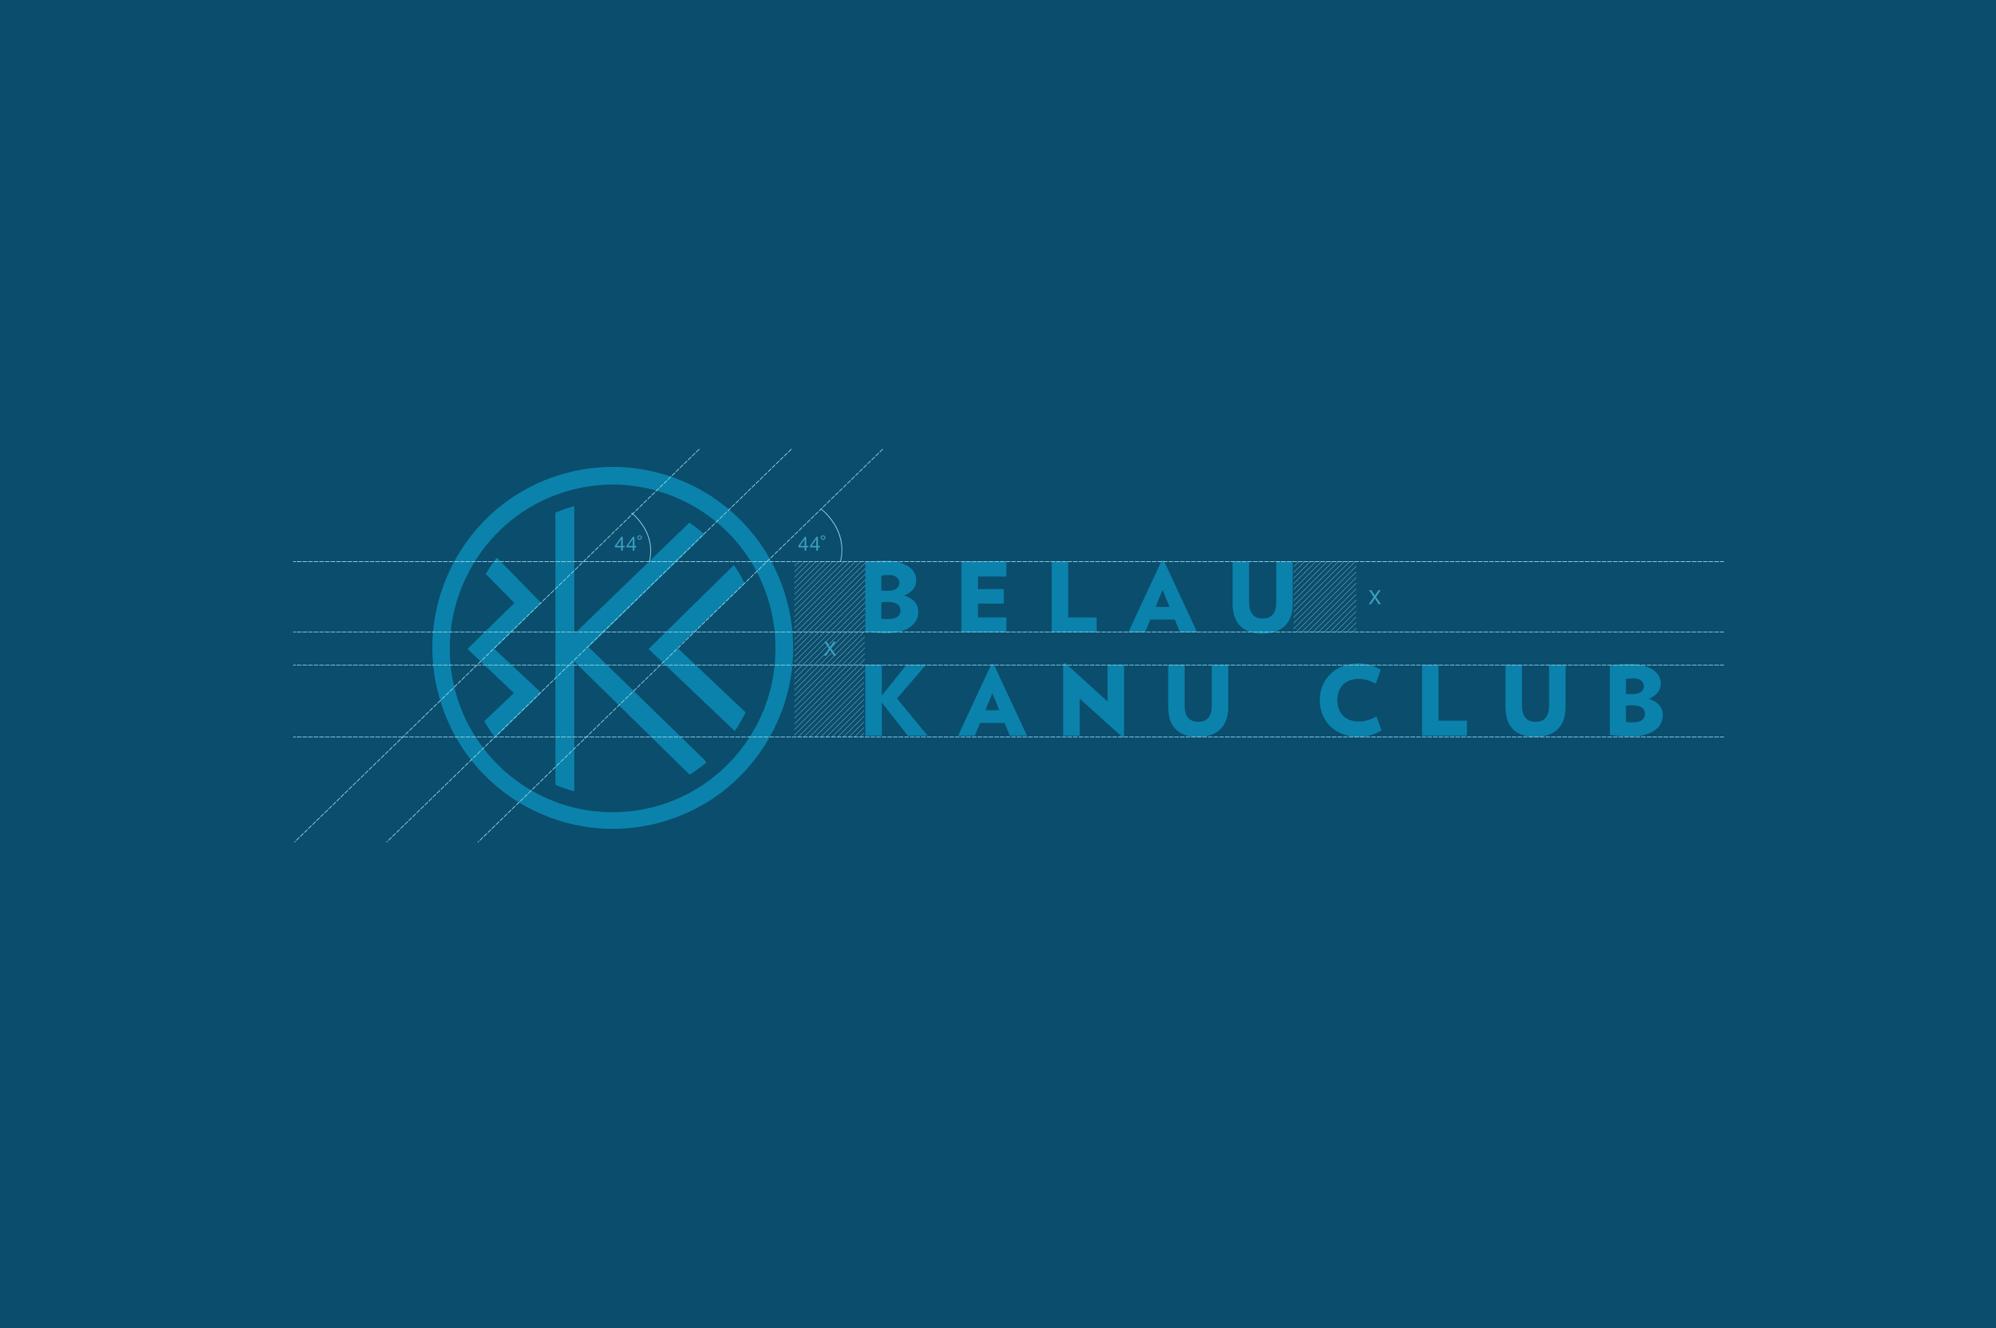 Belau Kanu Club logo build